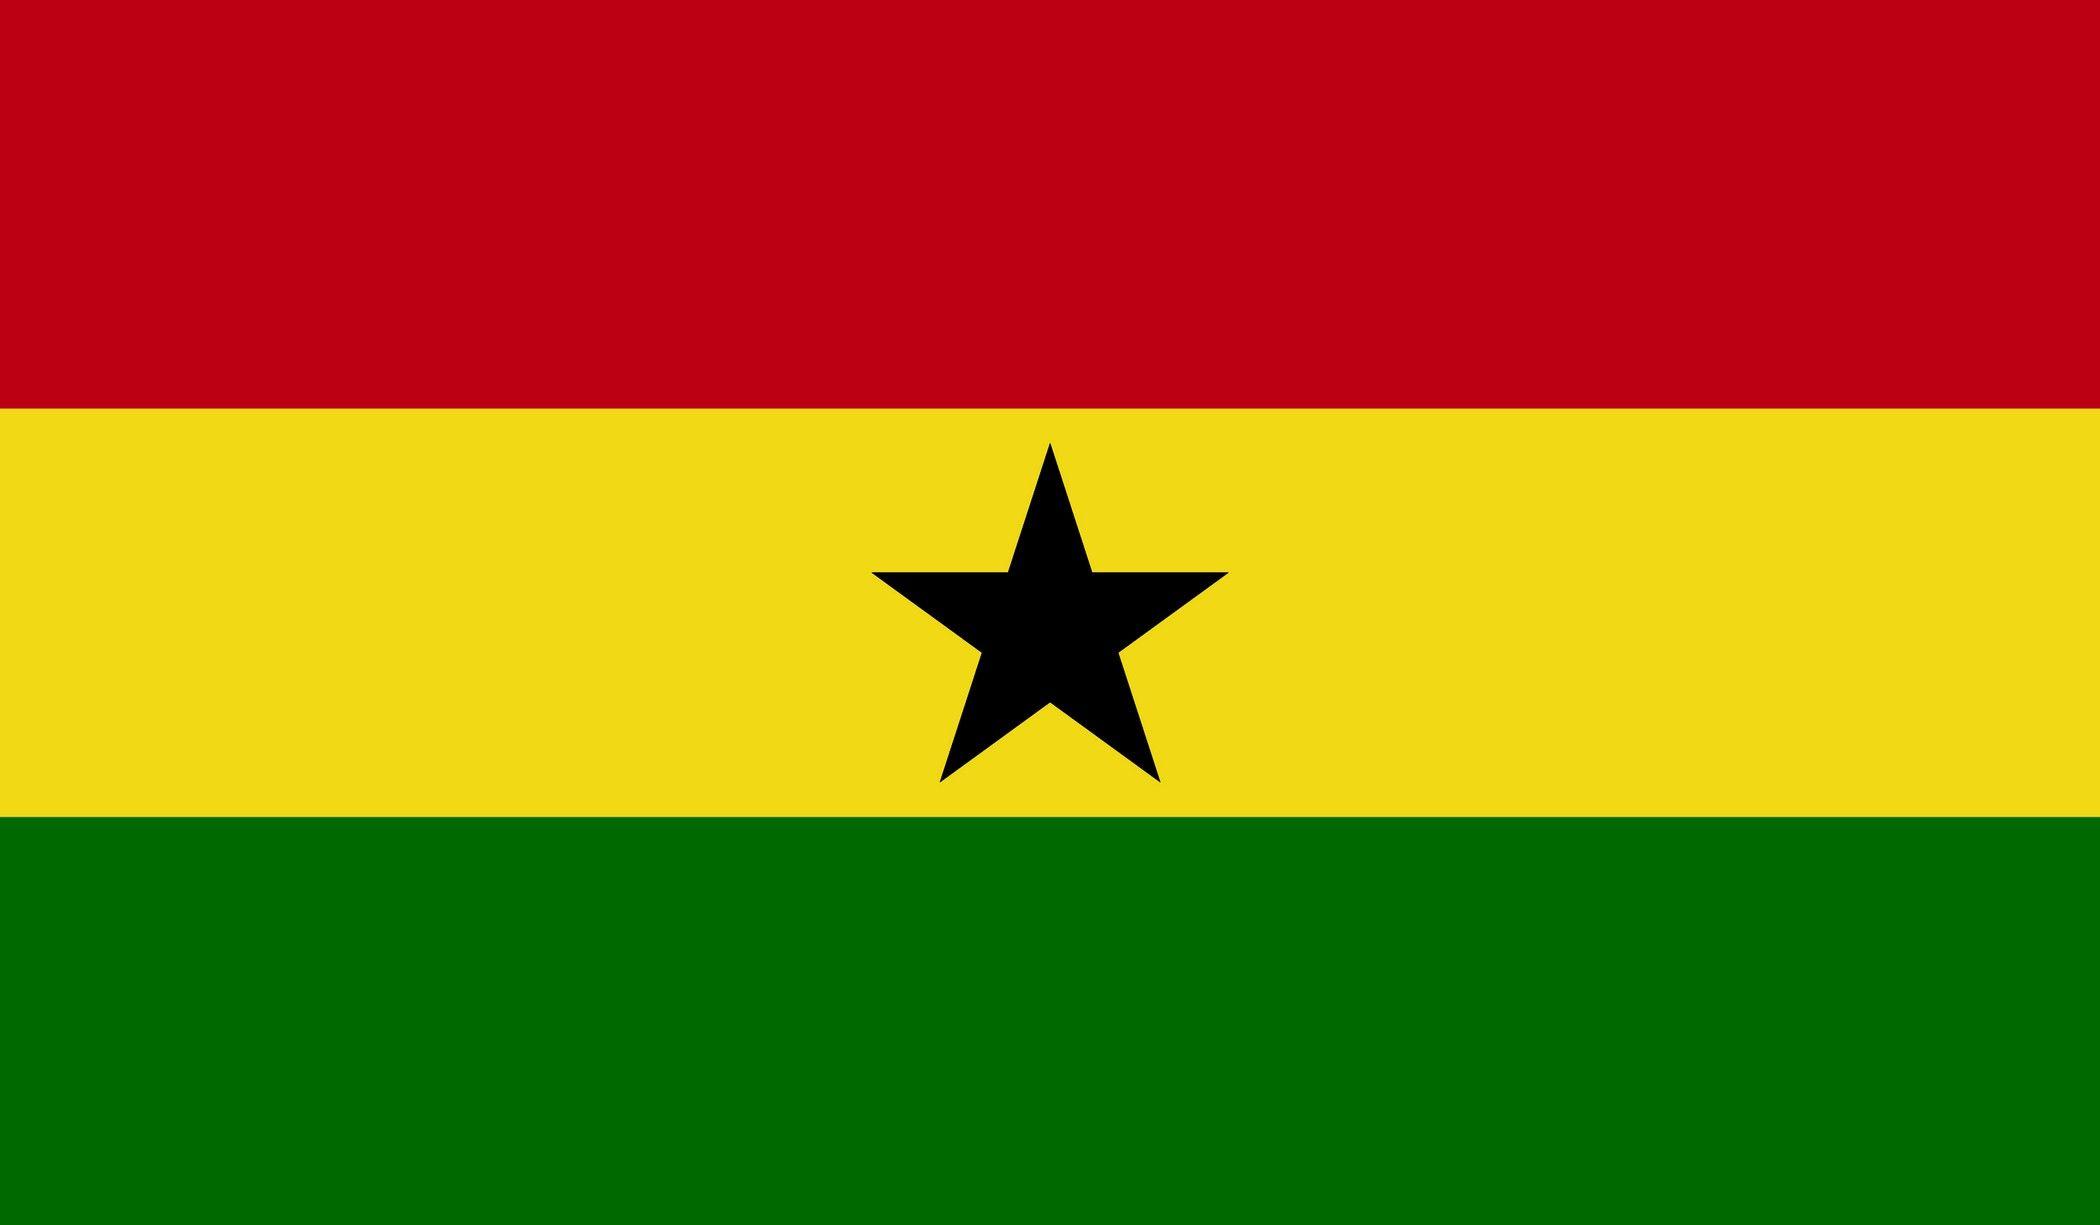 Ghana Flag Vector Free Logo Eps Download Ghana Flag Flag Coloring Pages Flag Colors